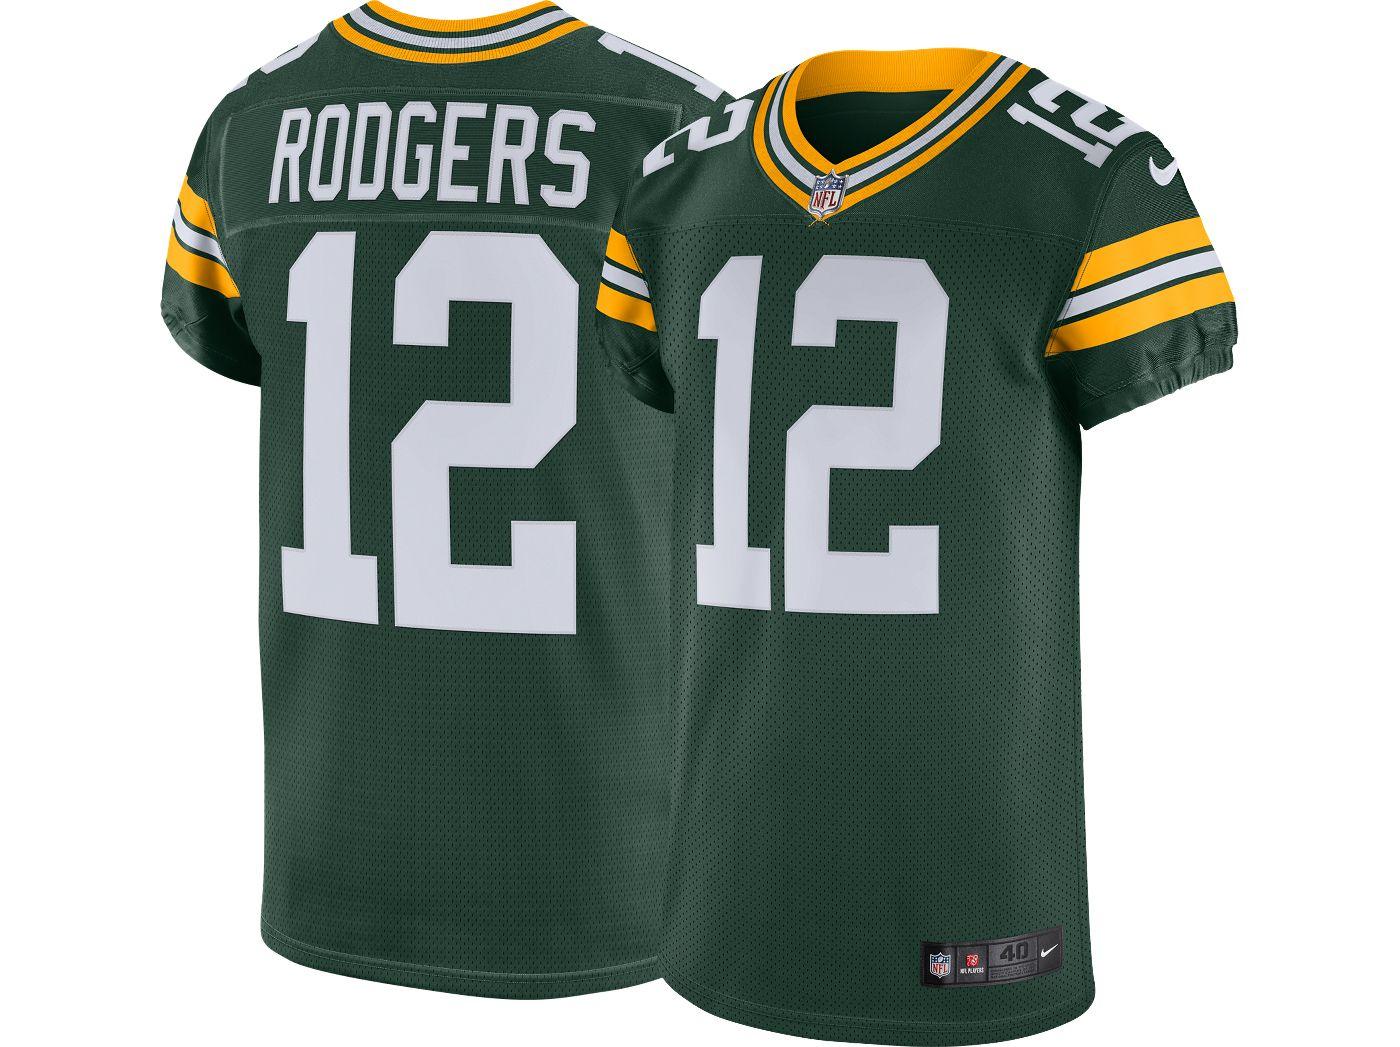 Nike Men's Home Elite Jersey Green Bay Packers Aaron Rodgers #12